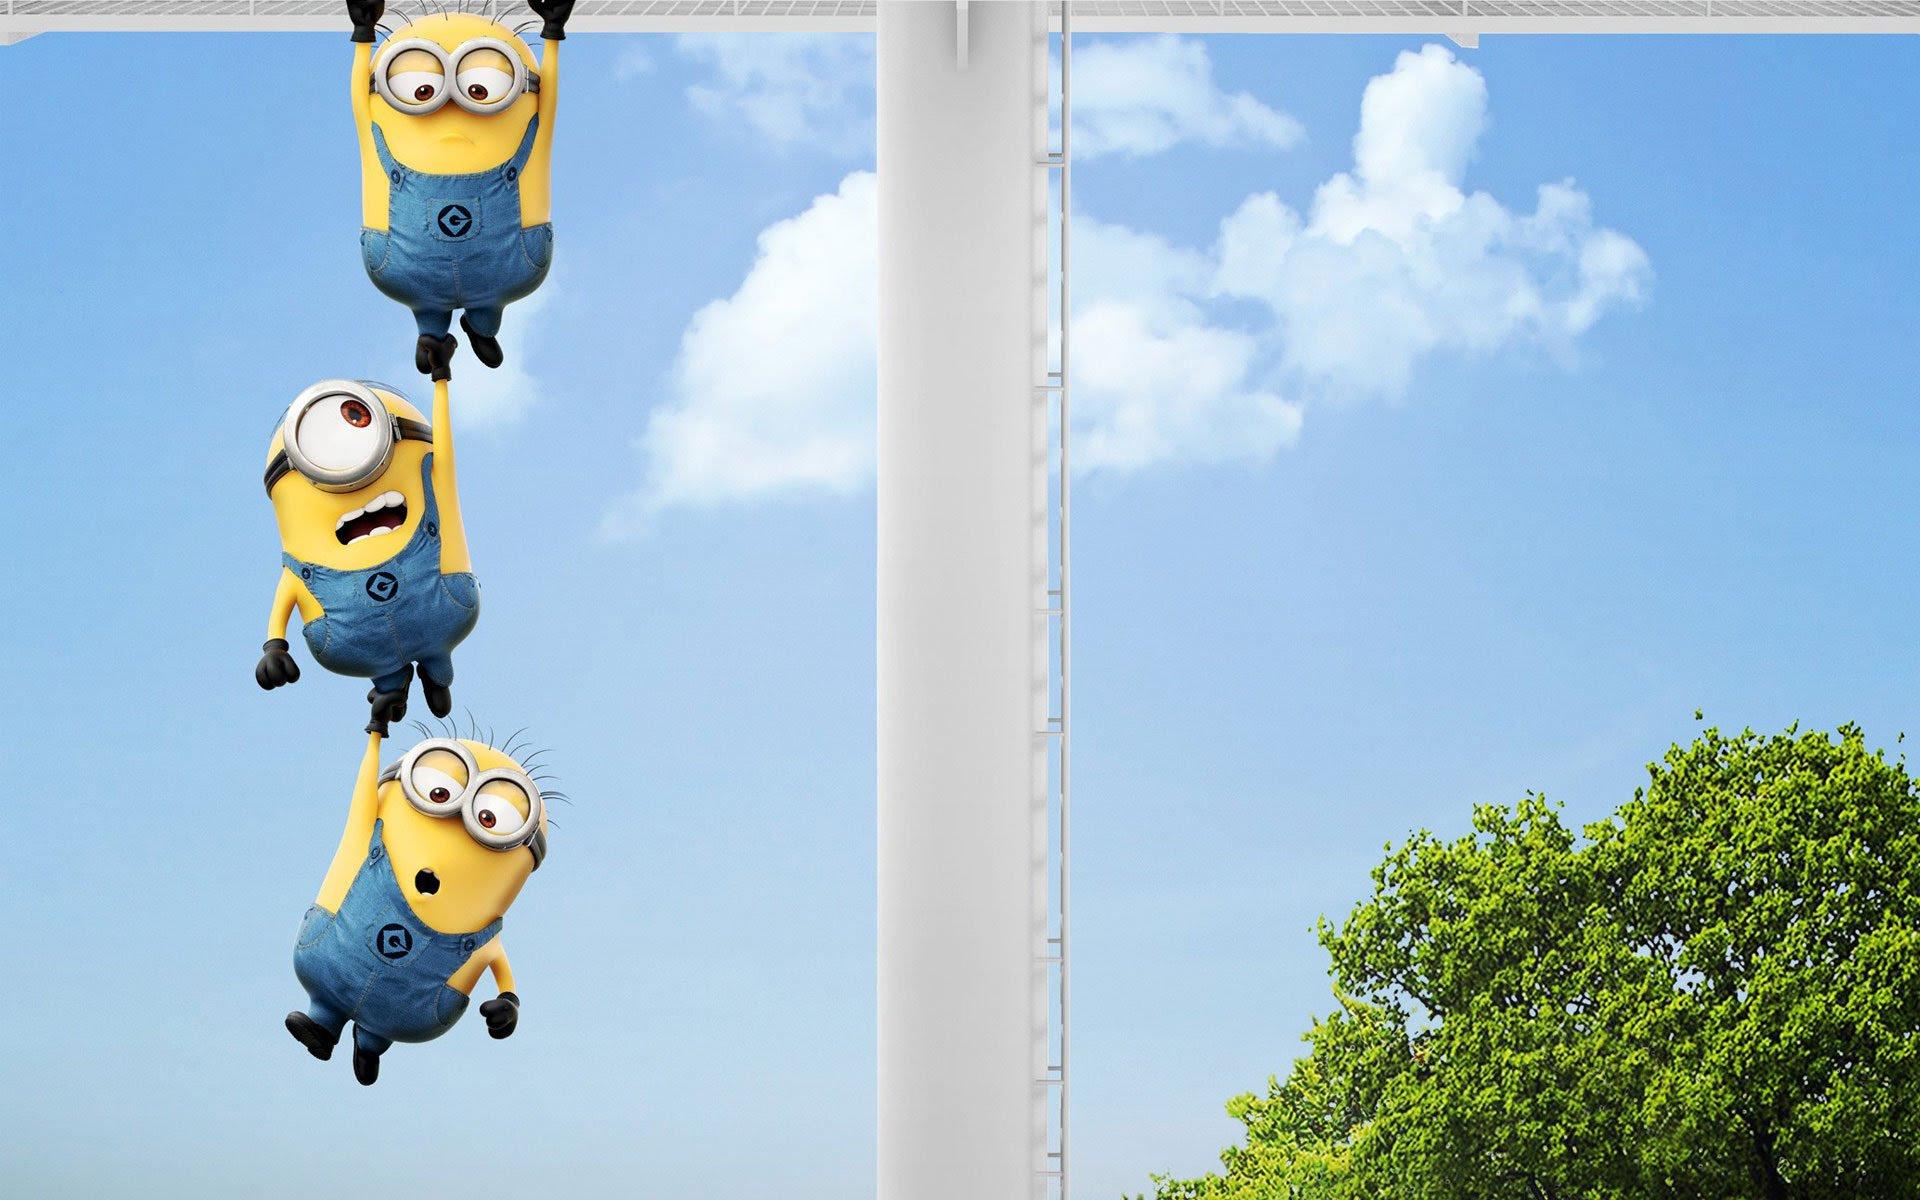 New Despicable Me 2 Minions Wallpaper Fan Art Collection Designbolts